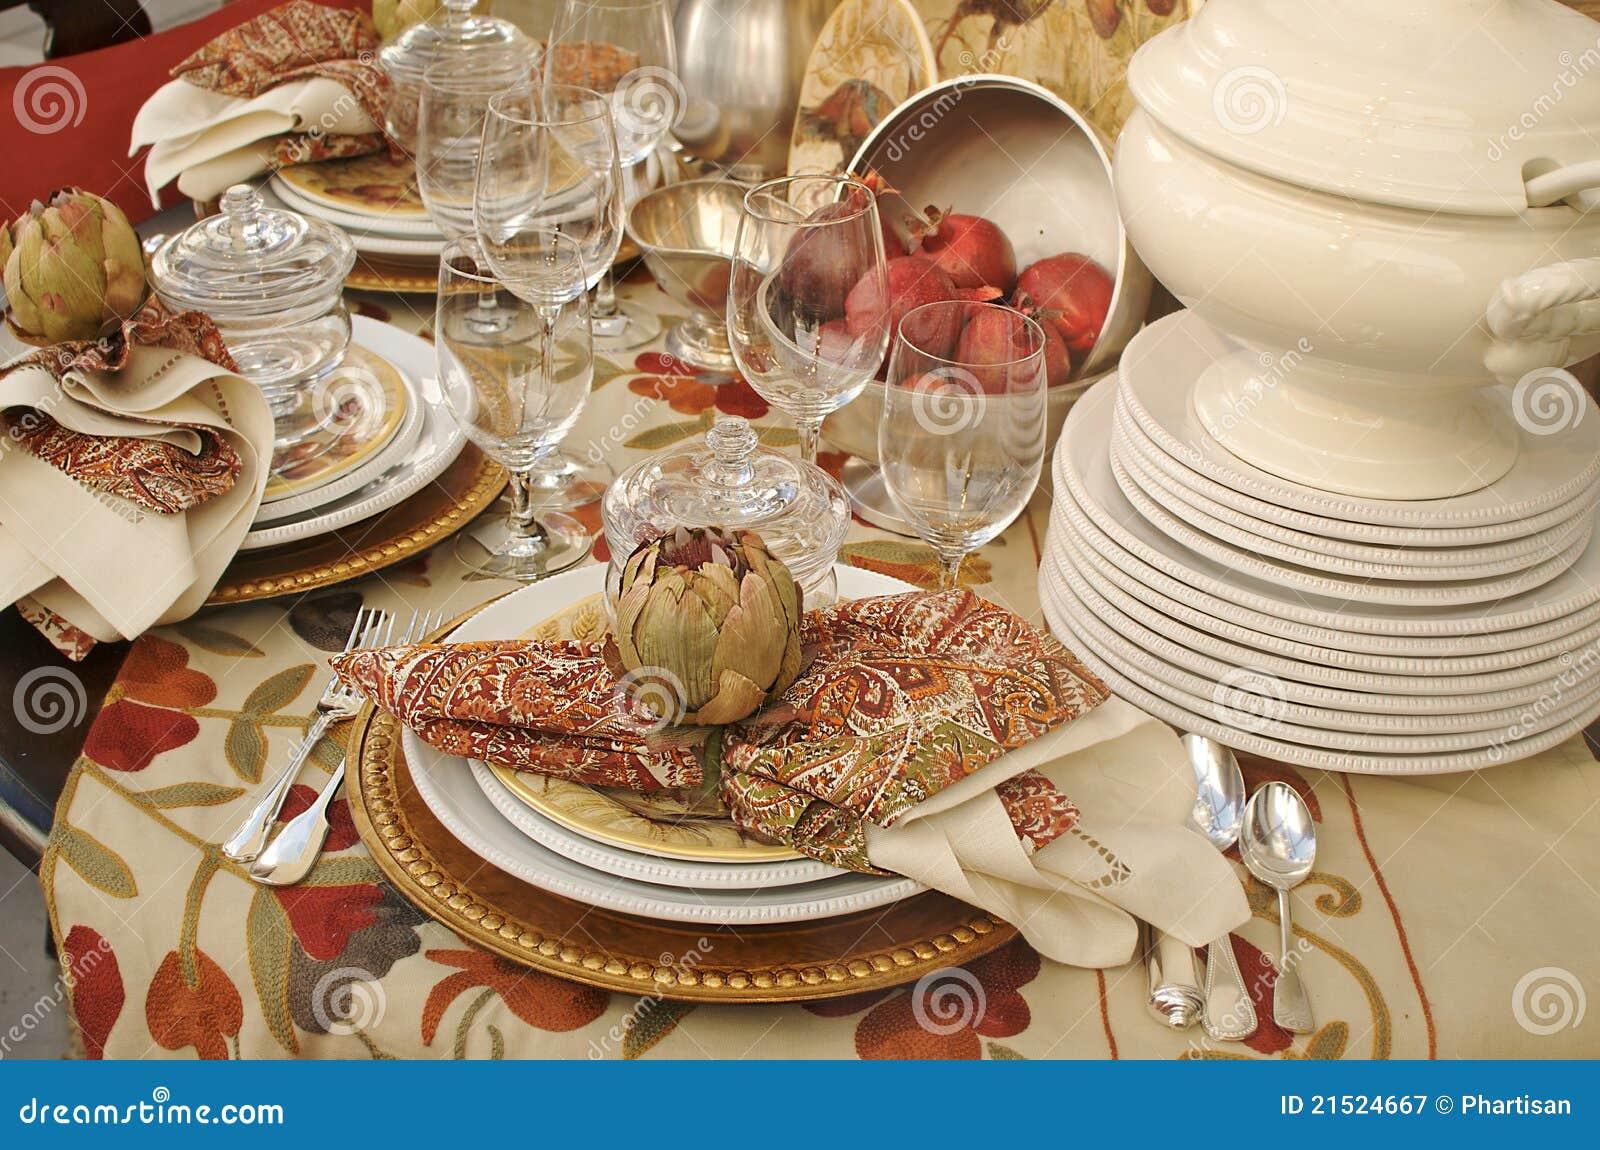 Fall dinner table setting